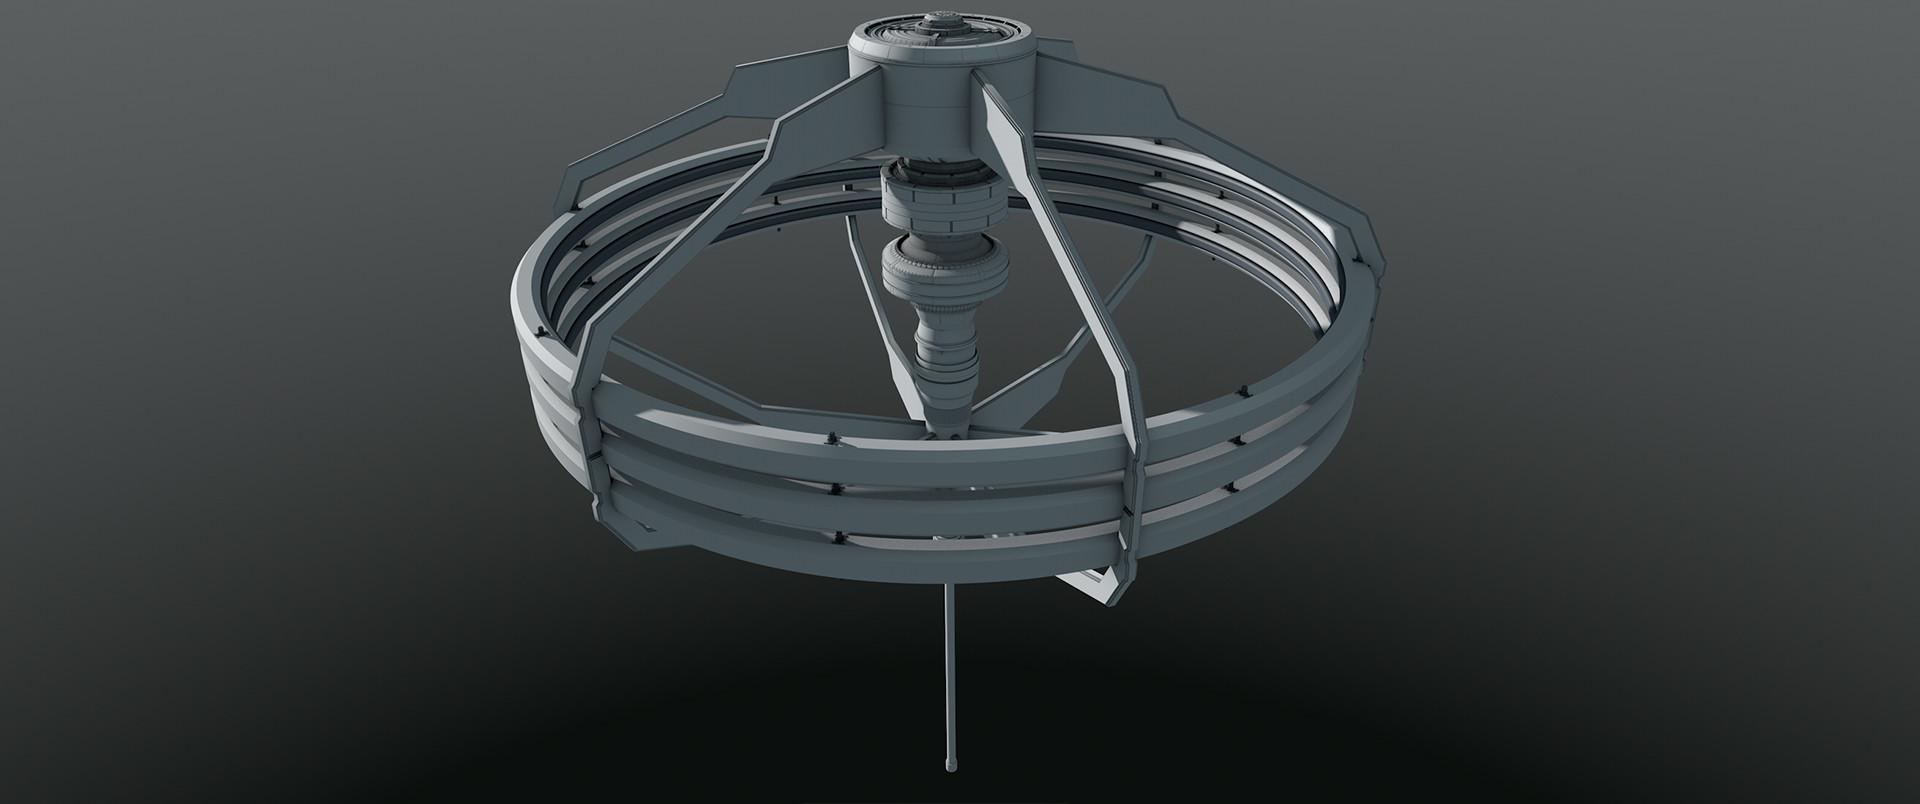 Glenn clovis spacestation concept 9 001